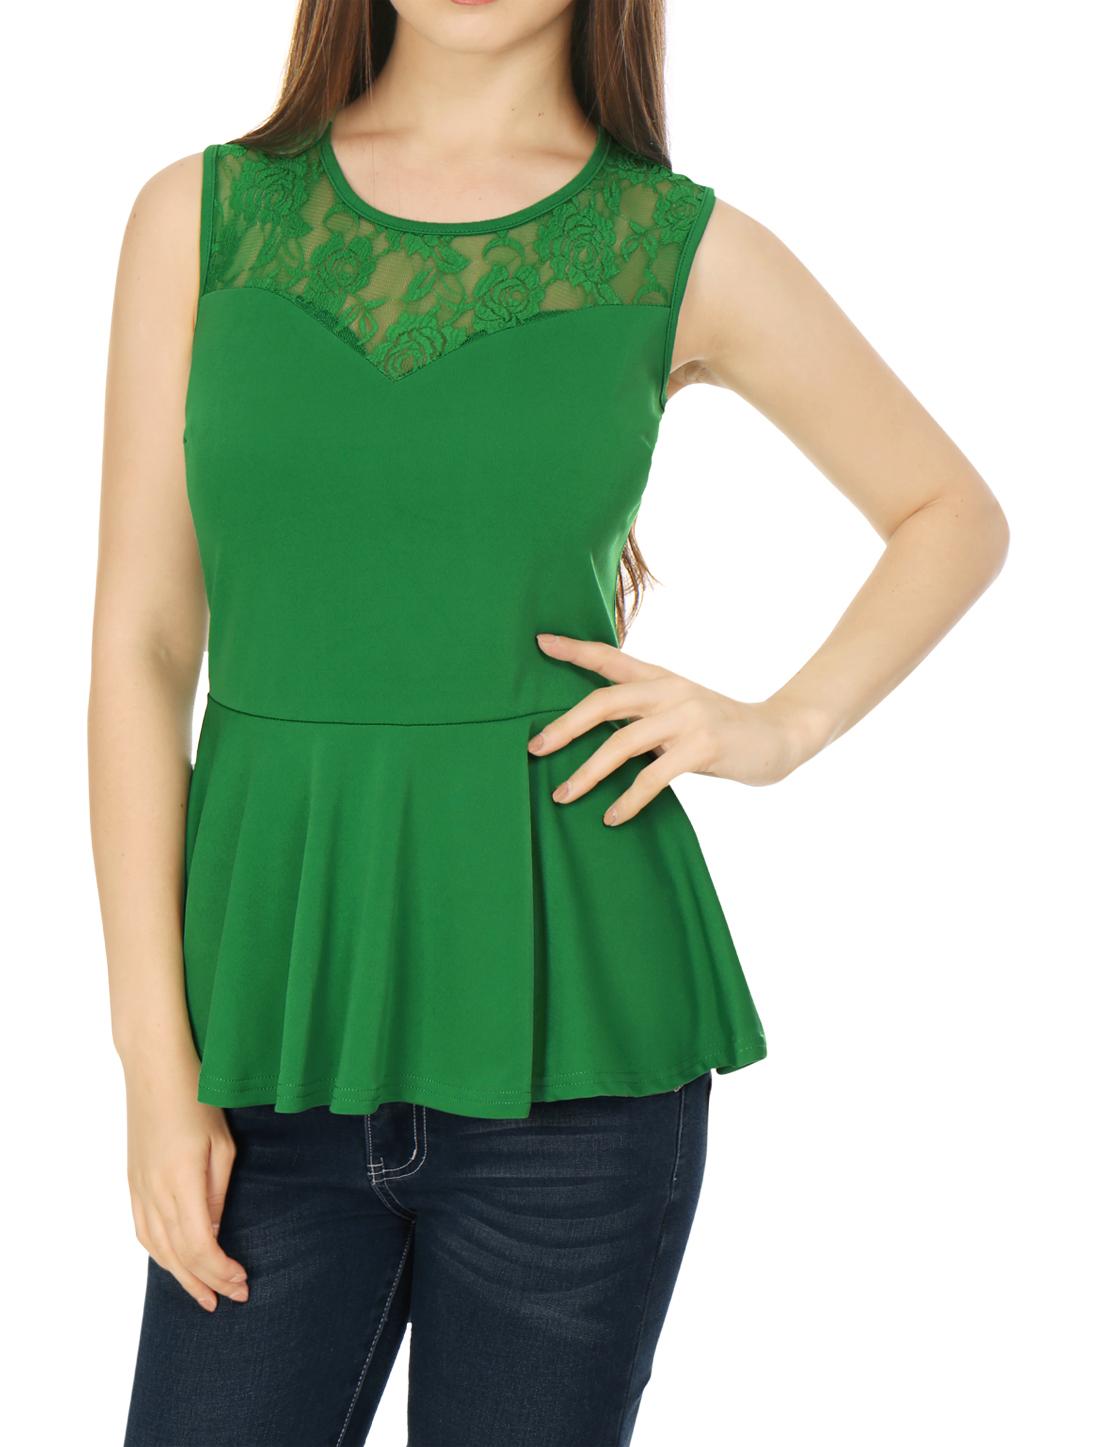 Women Round Neck Lace-Paneled Sleeveless Peplum Top Green S